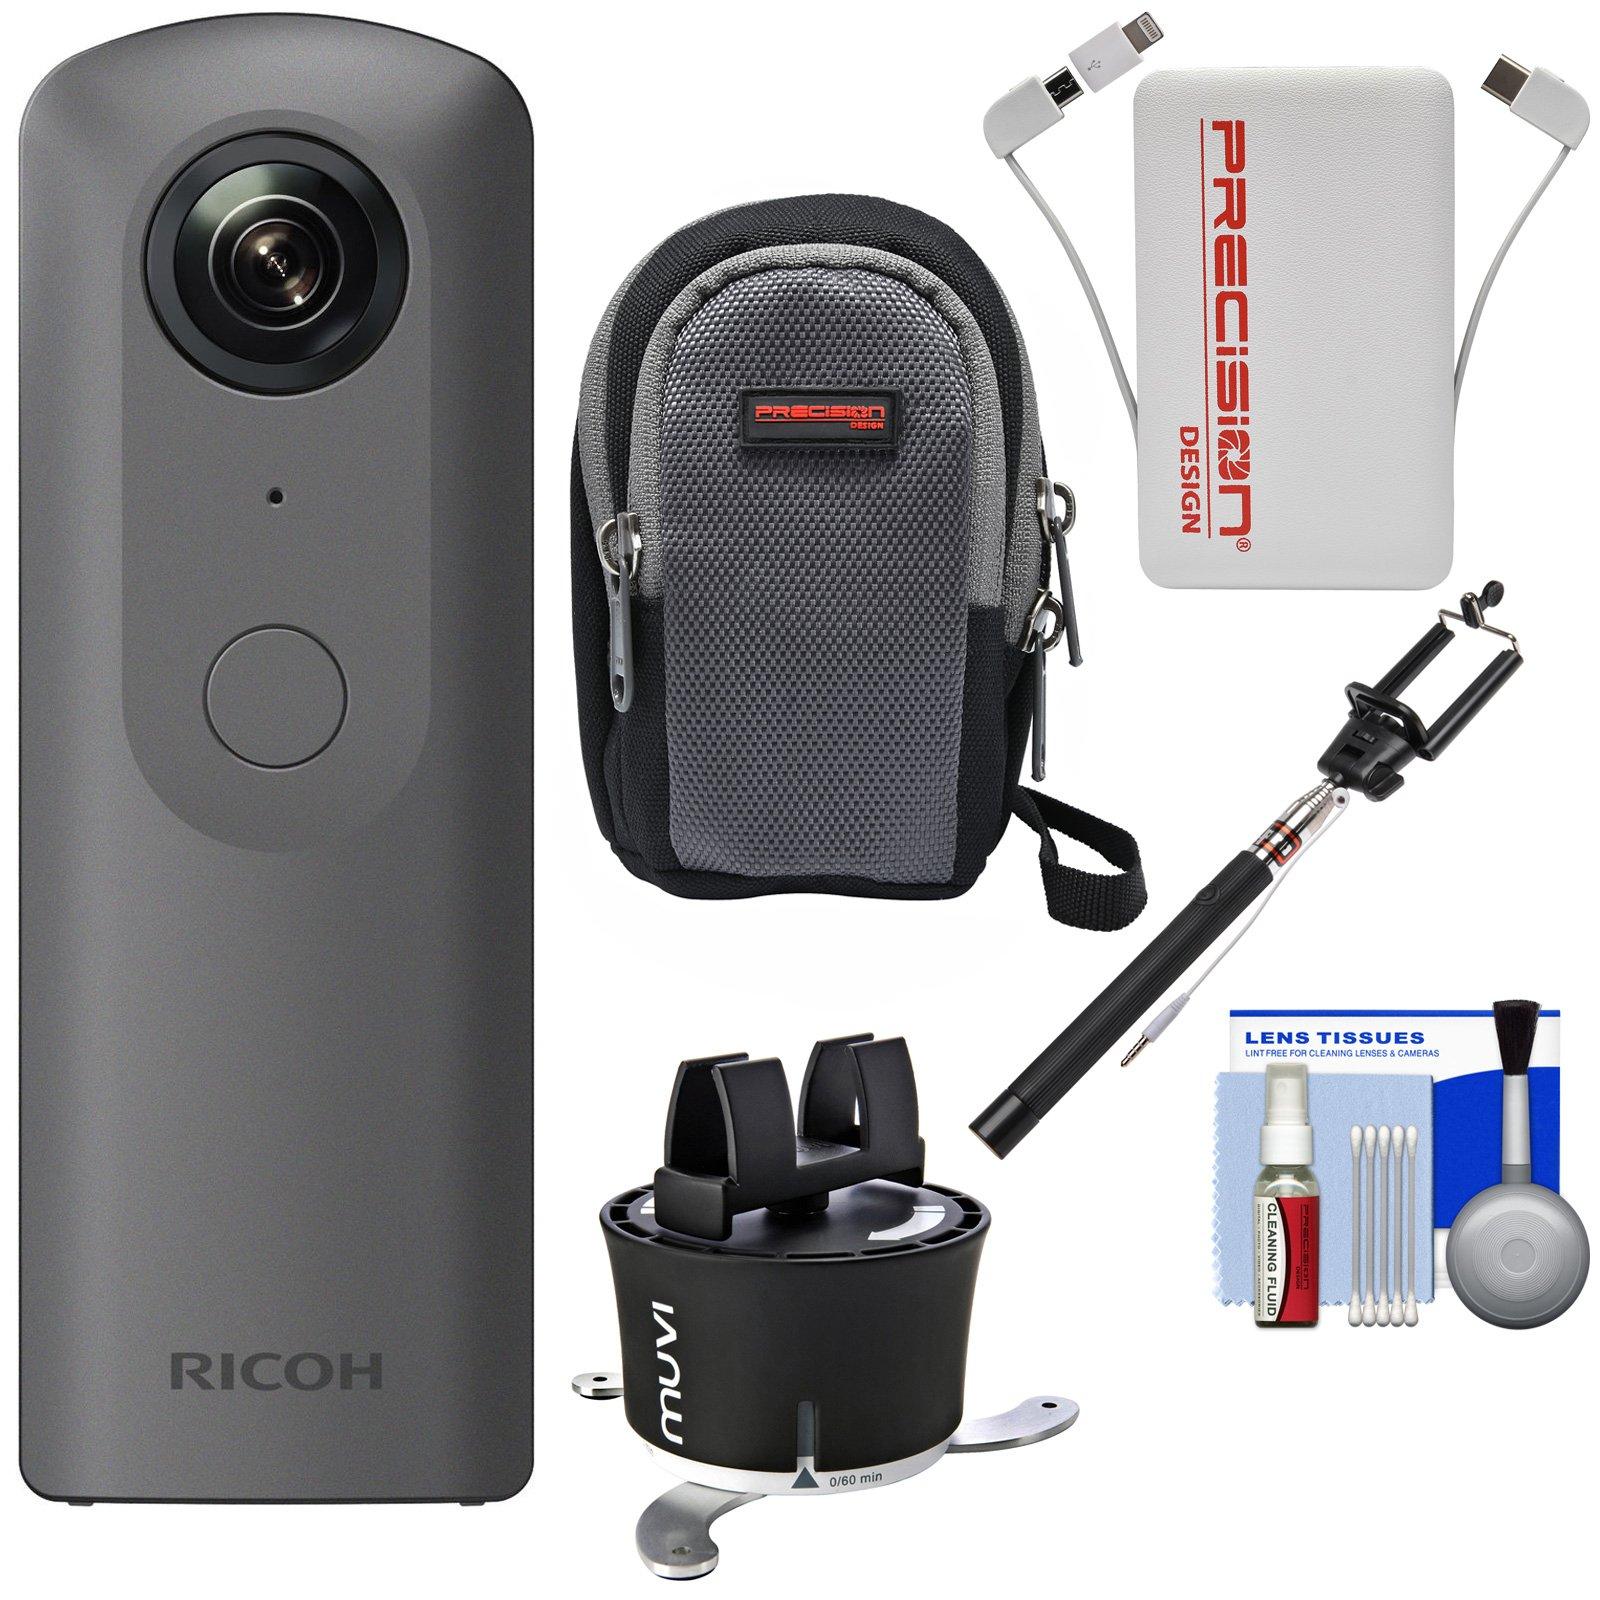 Ricoh Theta V 360-Degree Spherical 4K HD Digital Camera with Time Lapse Device + Selfie Stick + Power Bank + Case + Kit